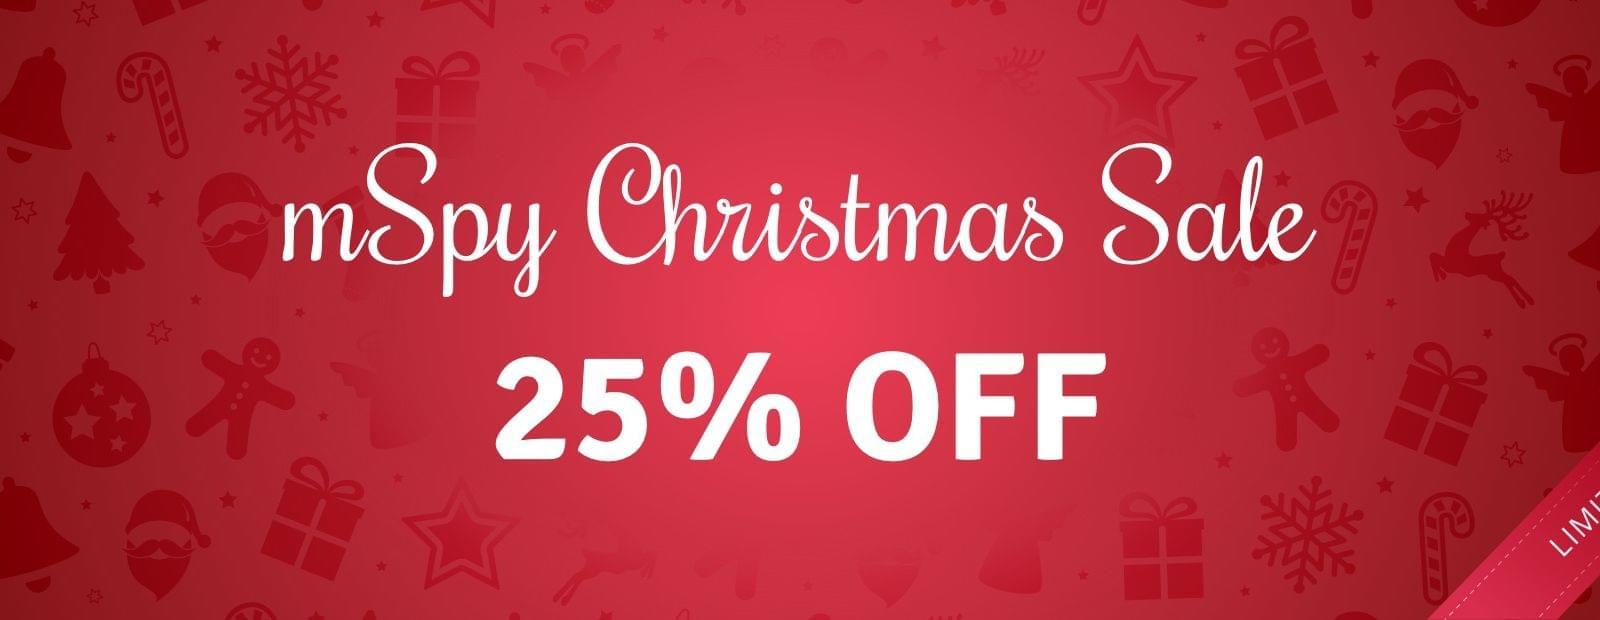 mSpy Christmas Sale